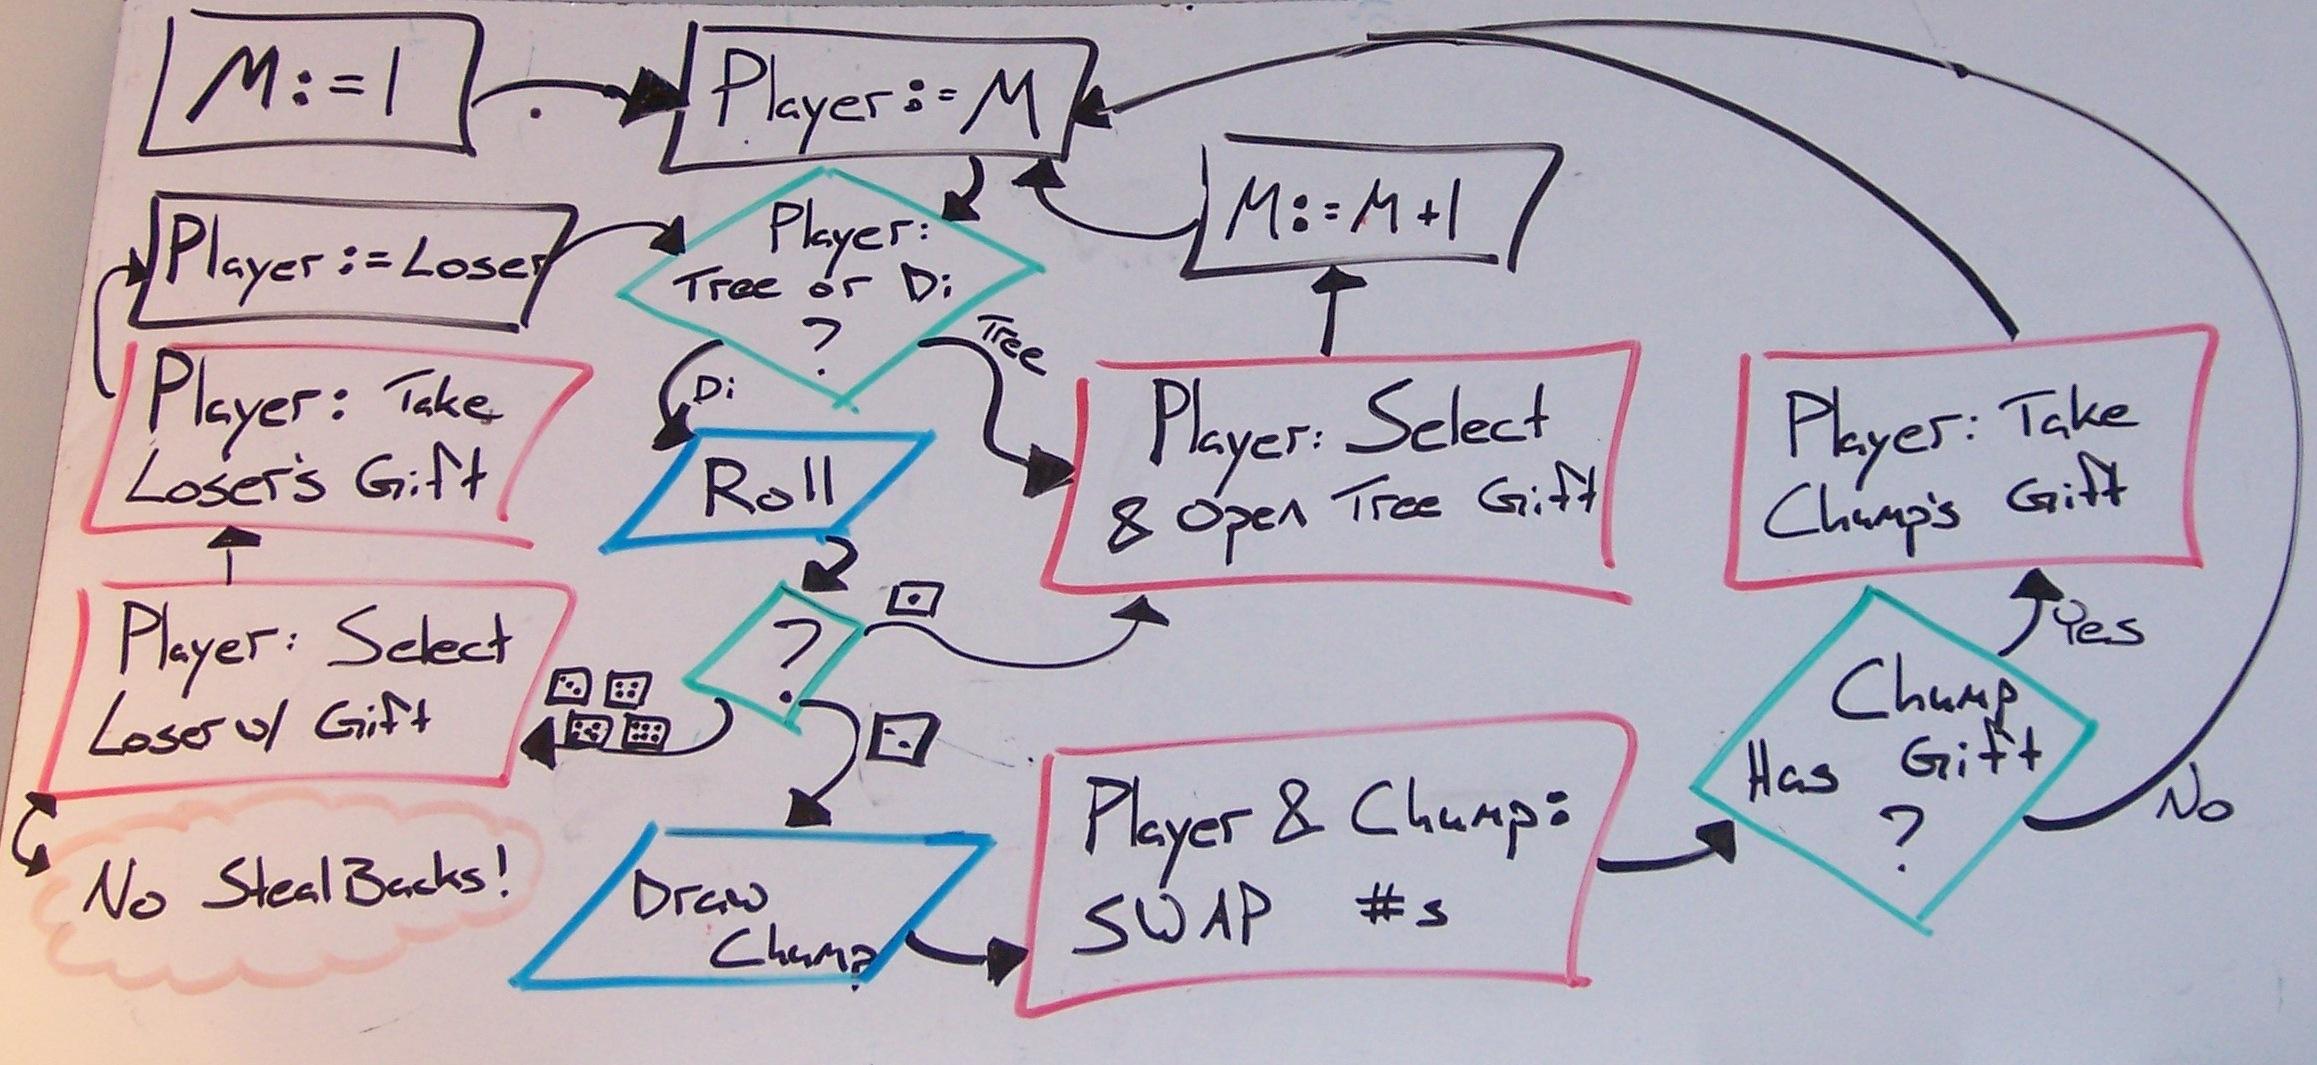 Melchior's Mixup Madness Flowchart (whiteboard)